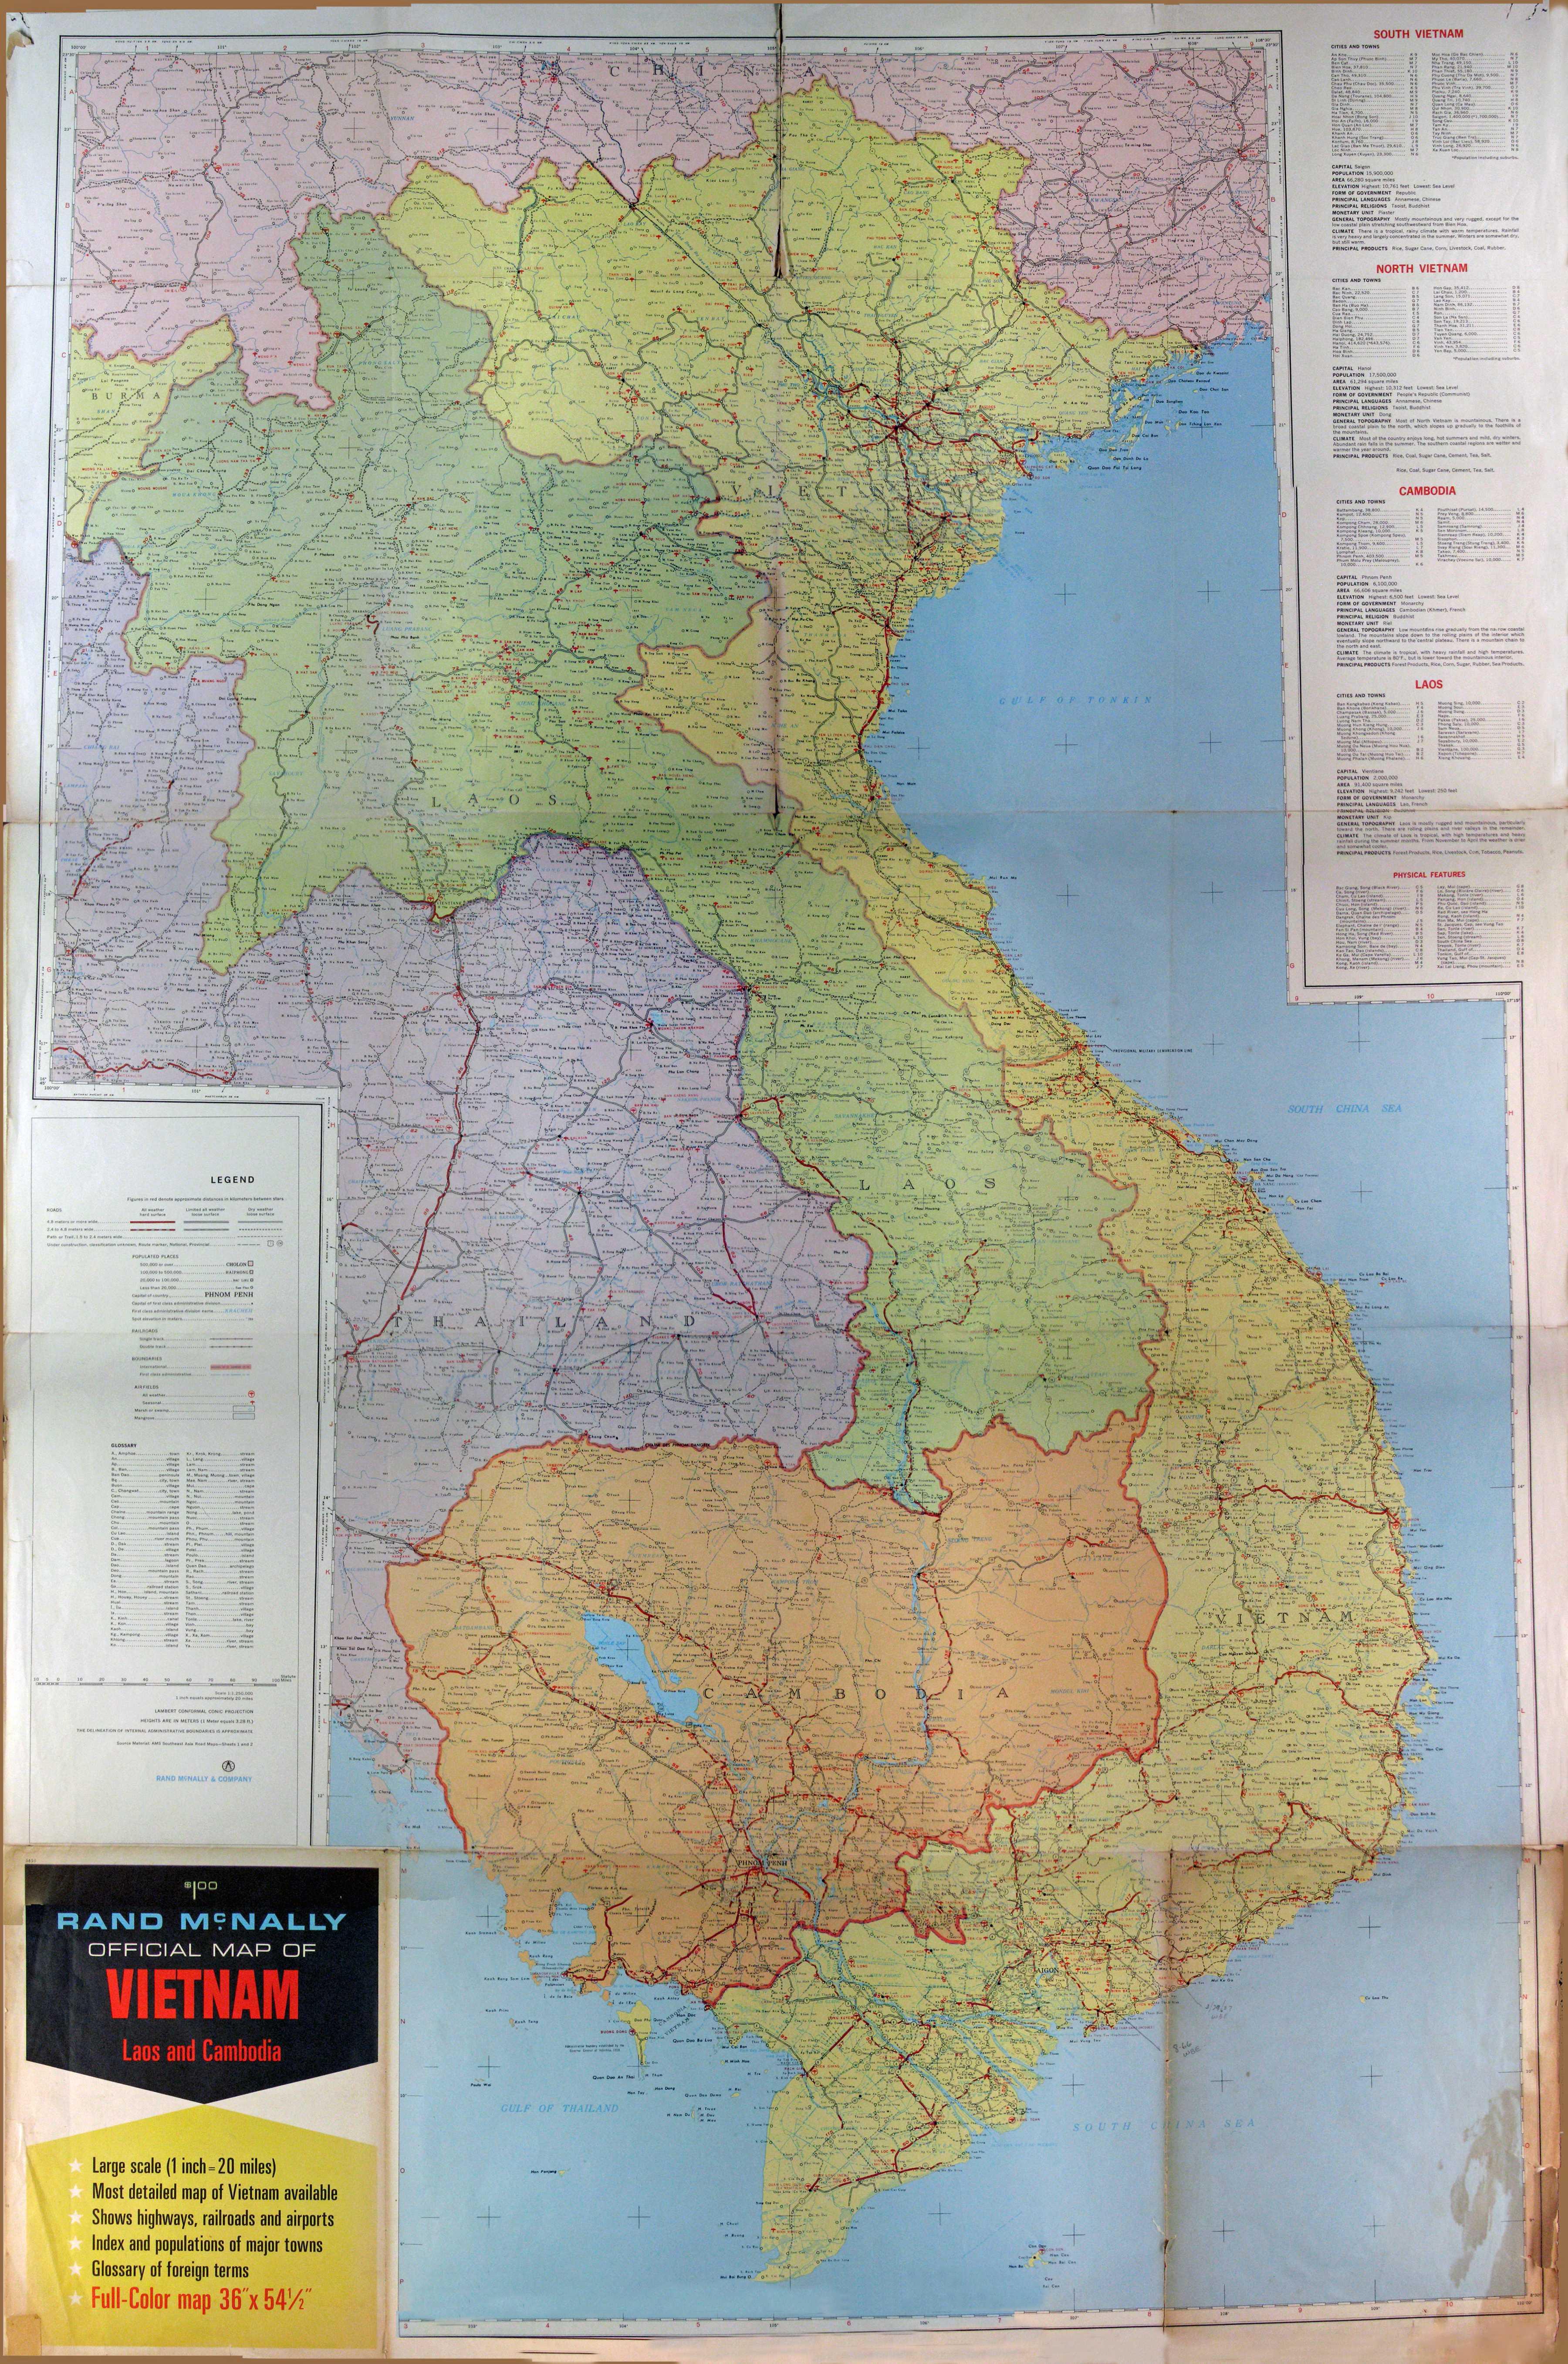 Rand McNally Map of Vietnam